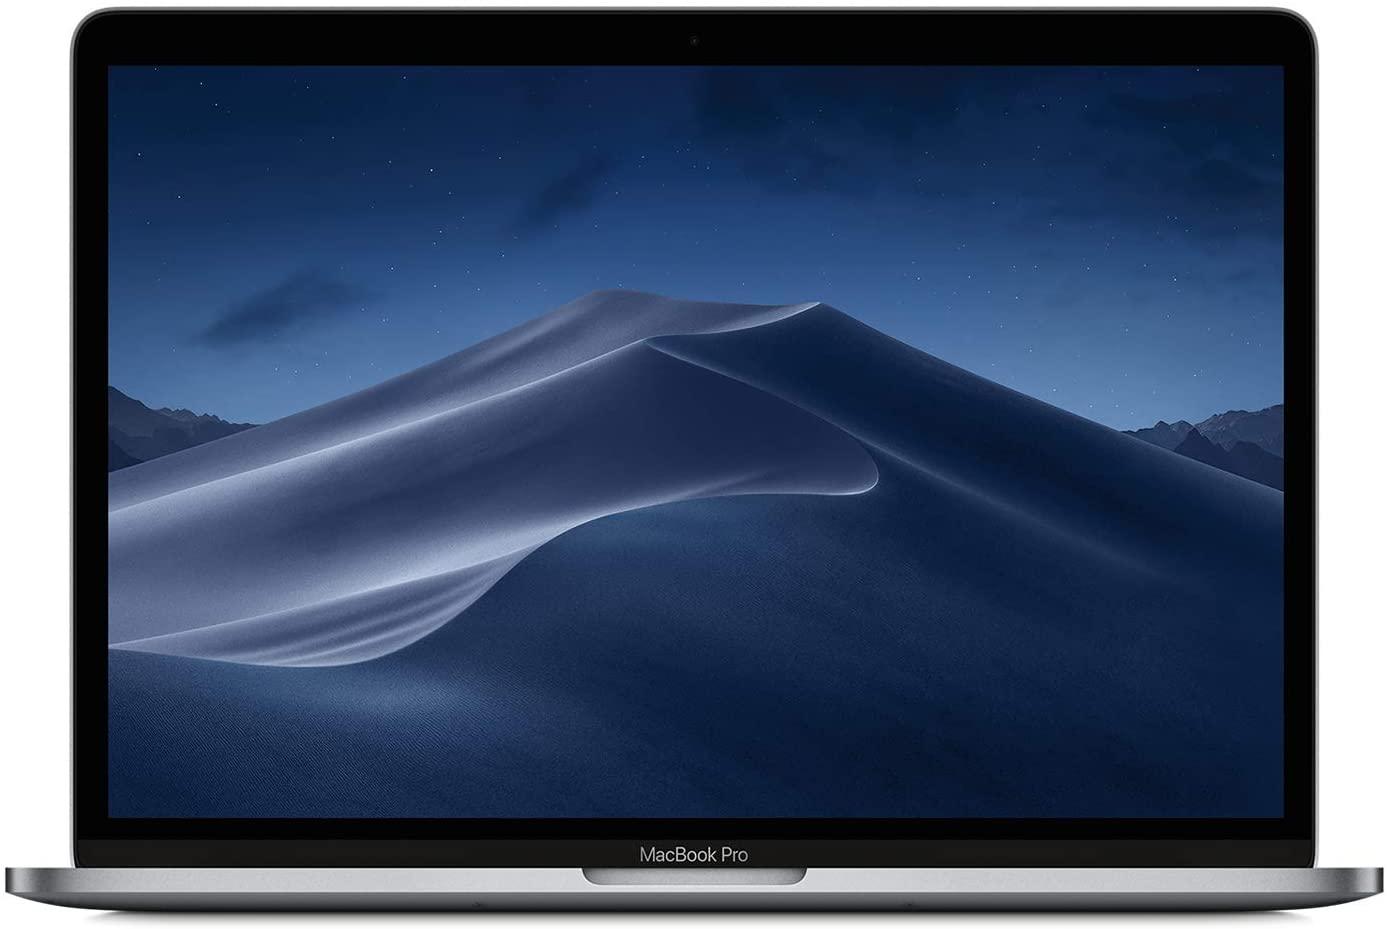 Apple MacBook Pro 13 Zoll Modell 2019 vorgestellt